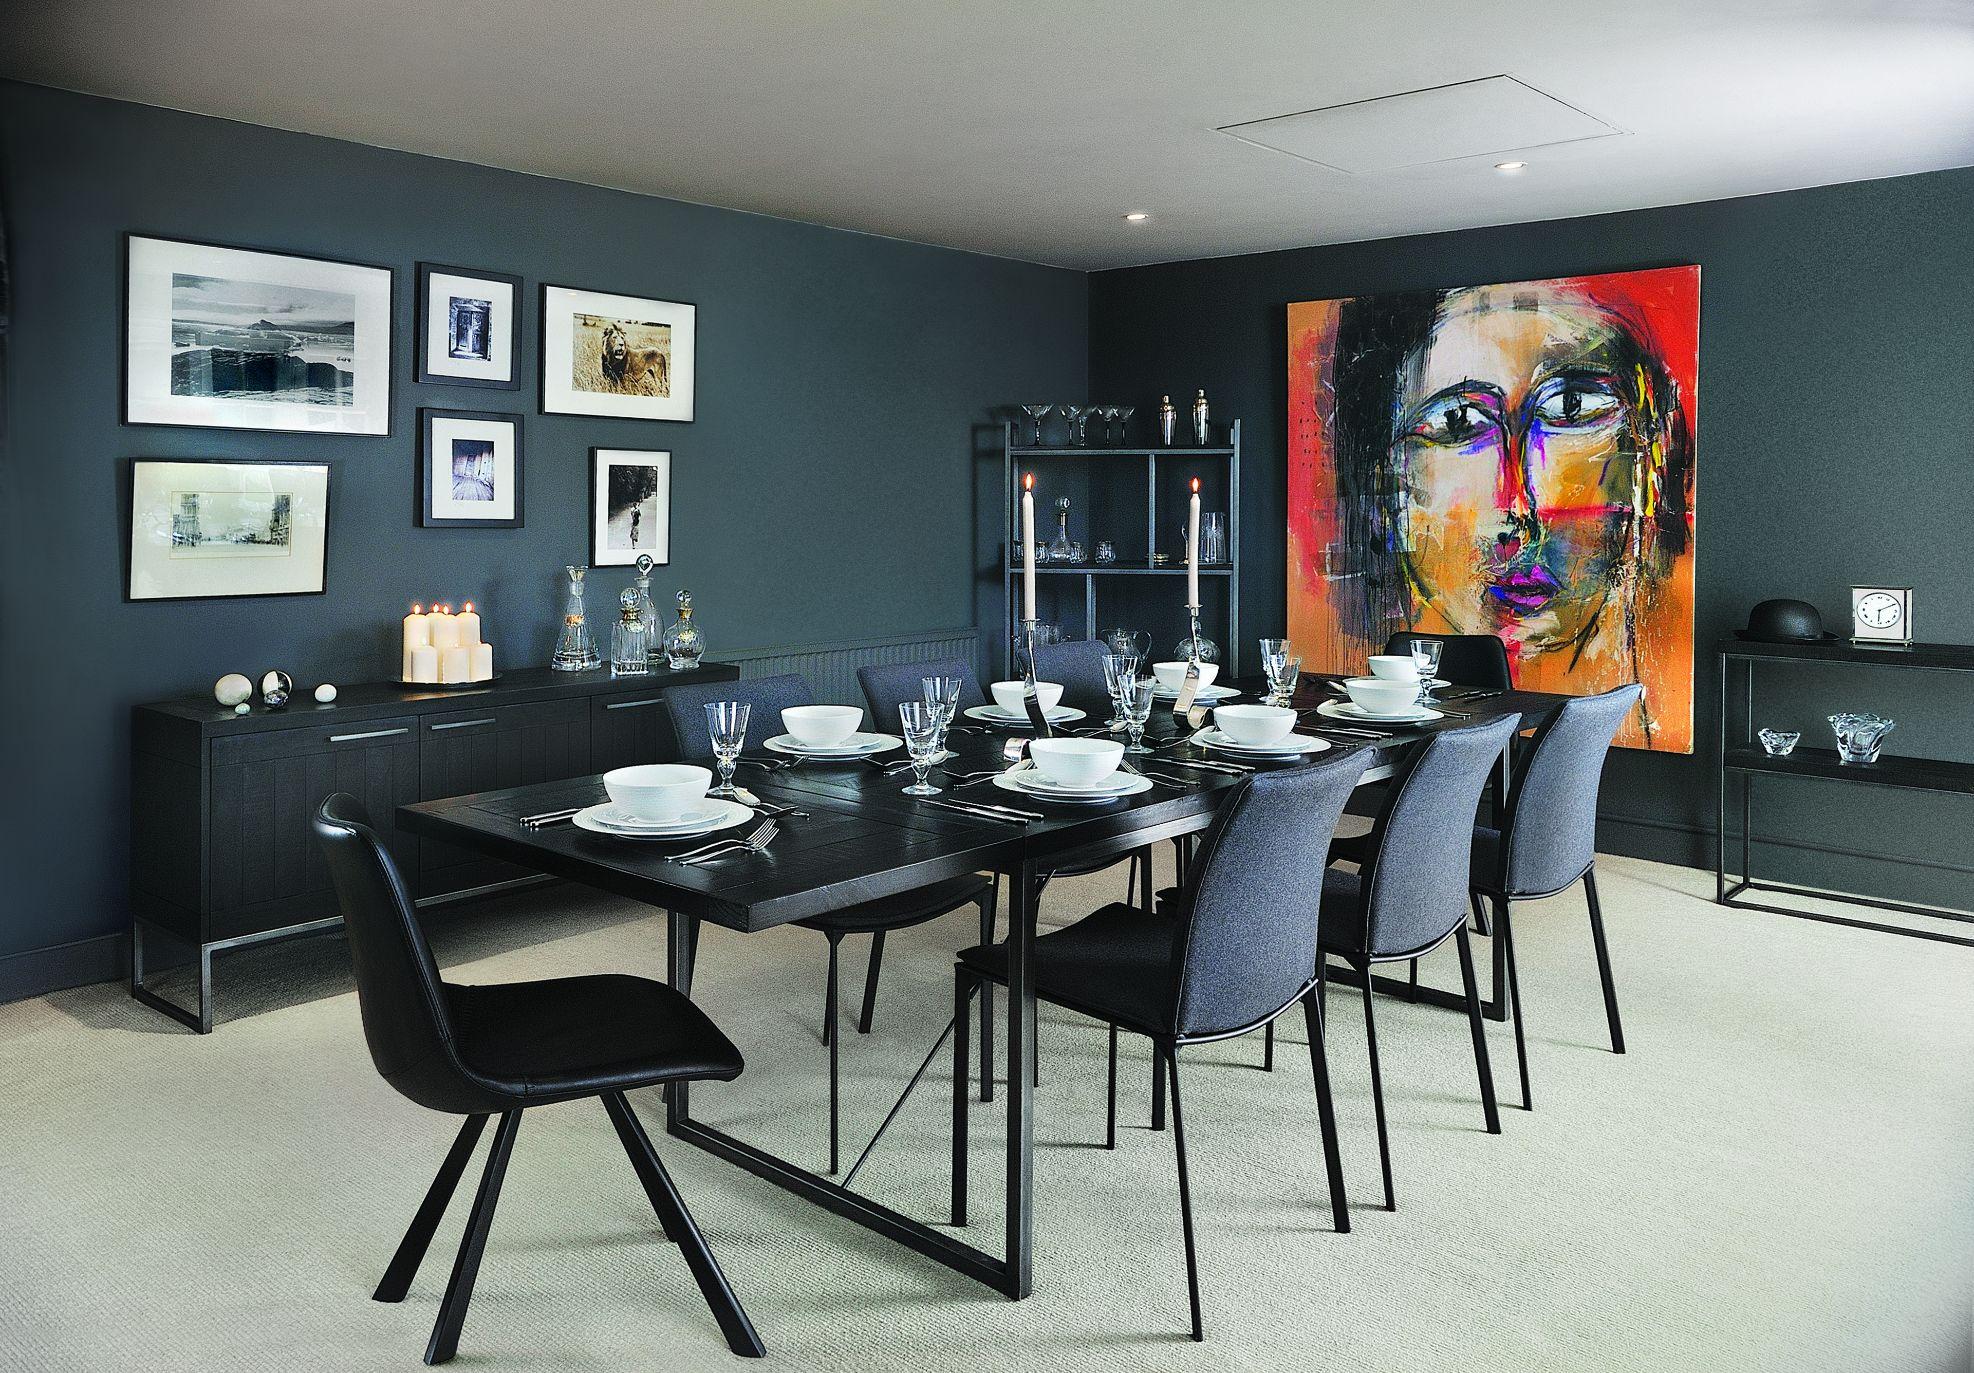 Rowico - DALTON CHARCOAL - Living & Dining